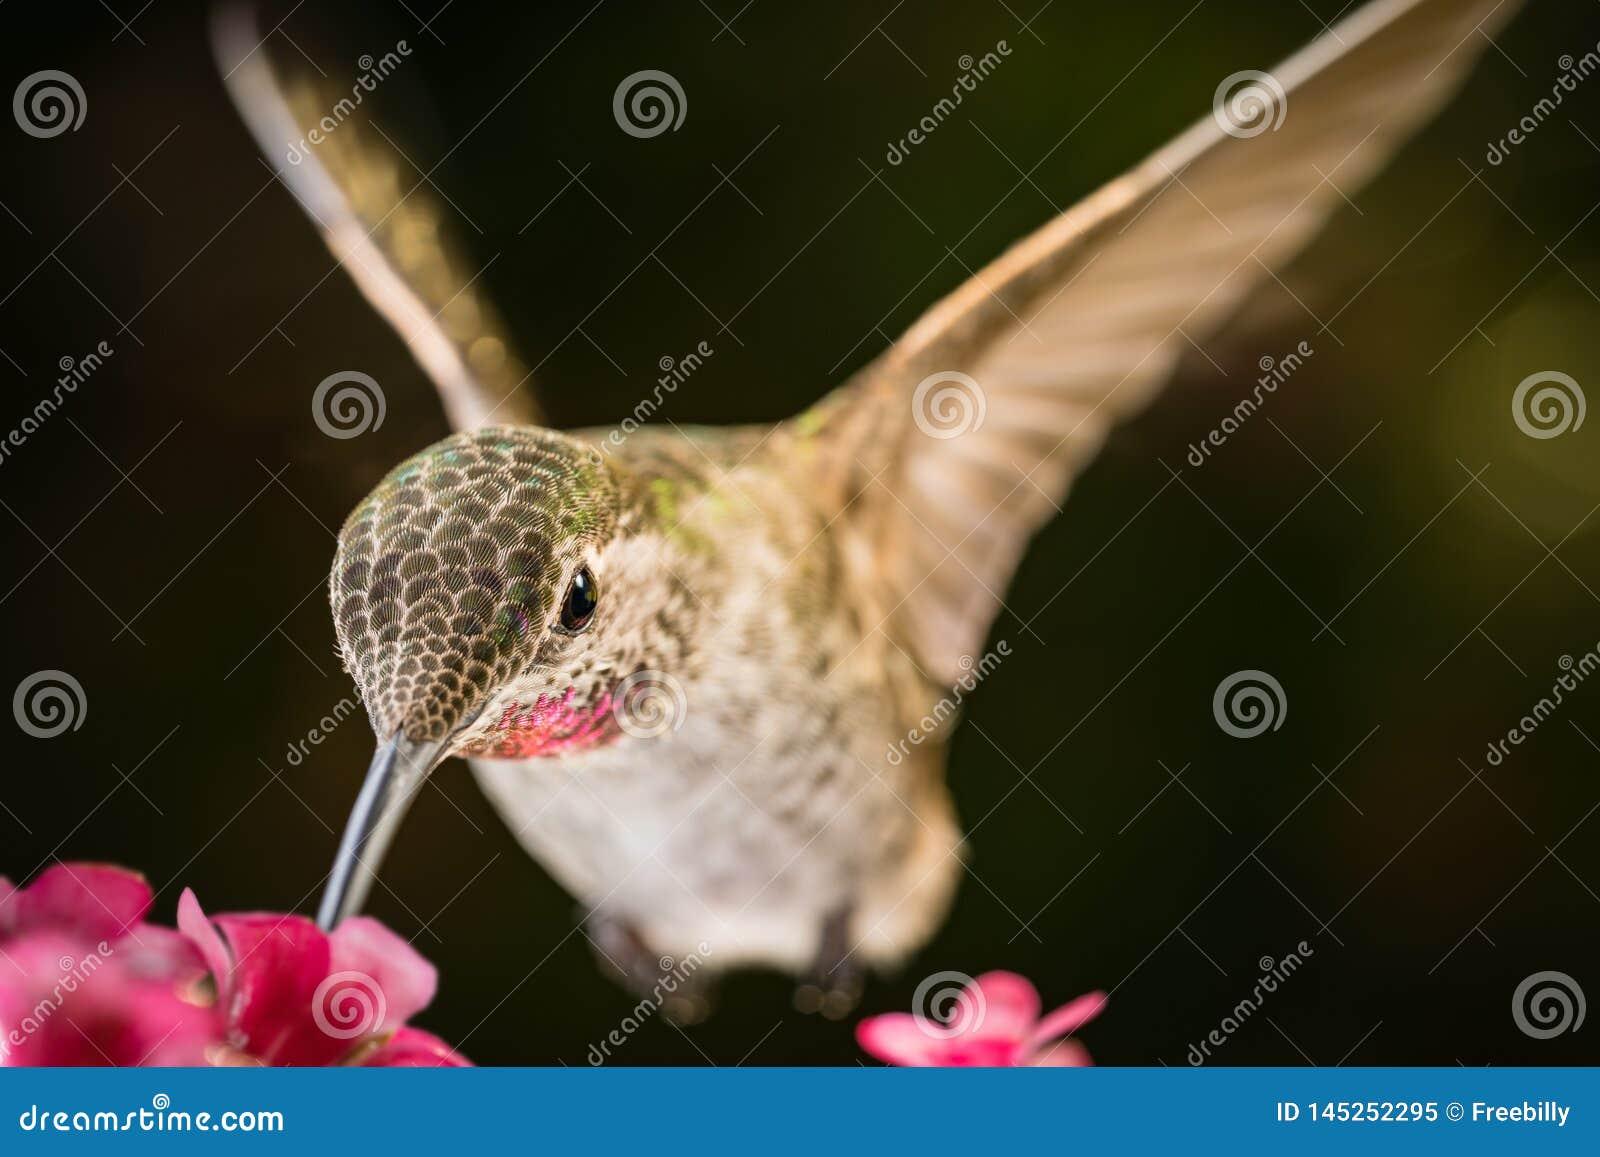 Hummingbird visits pink flowers